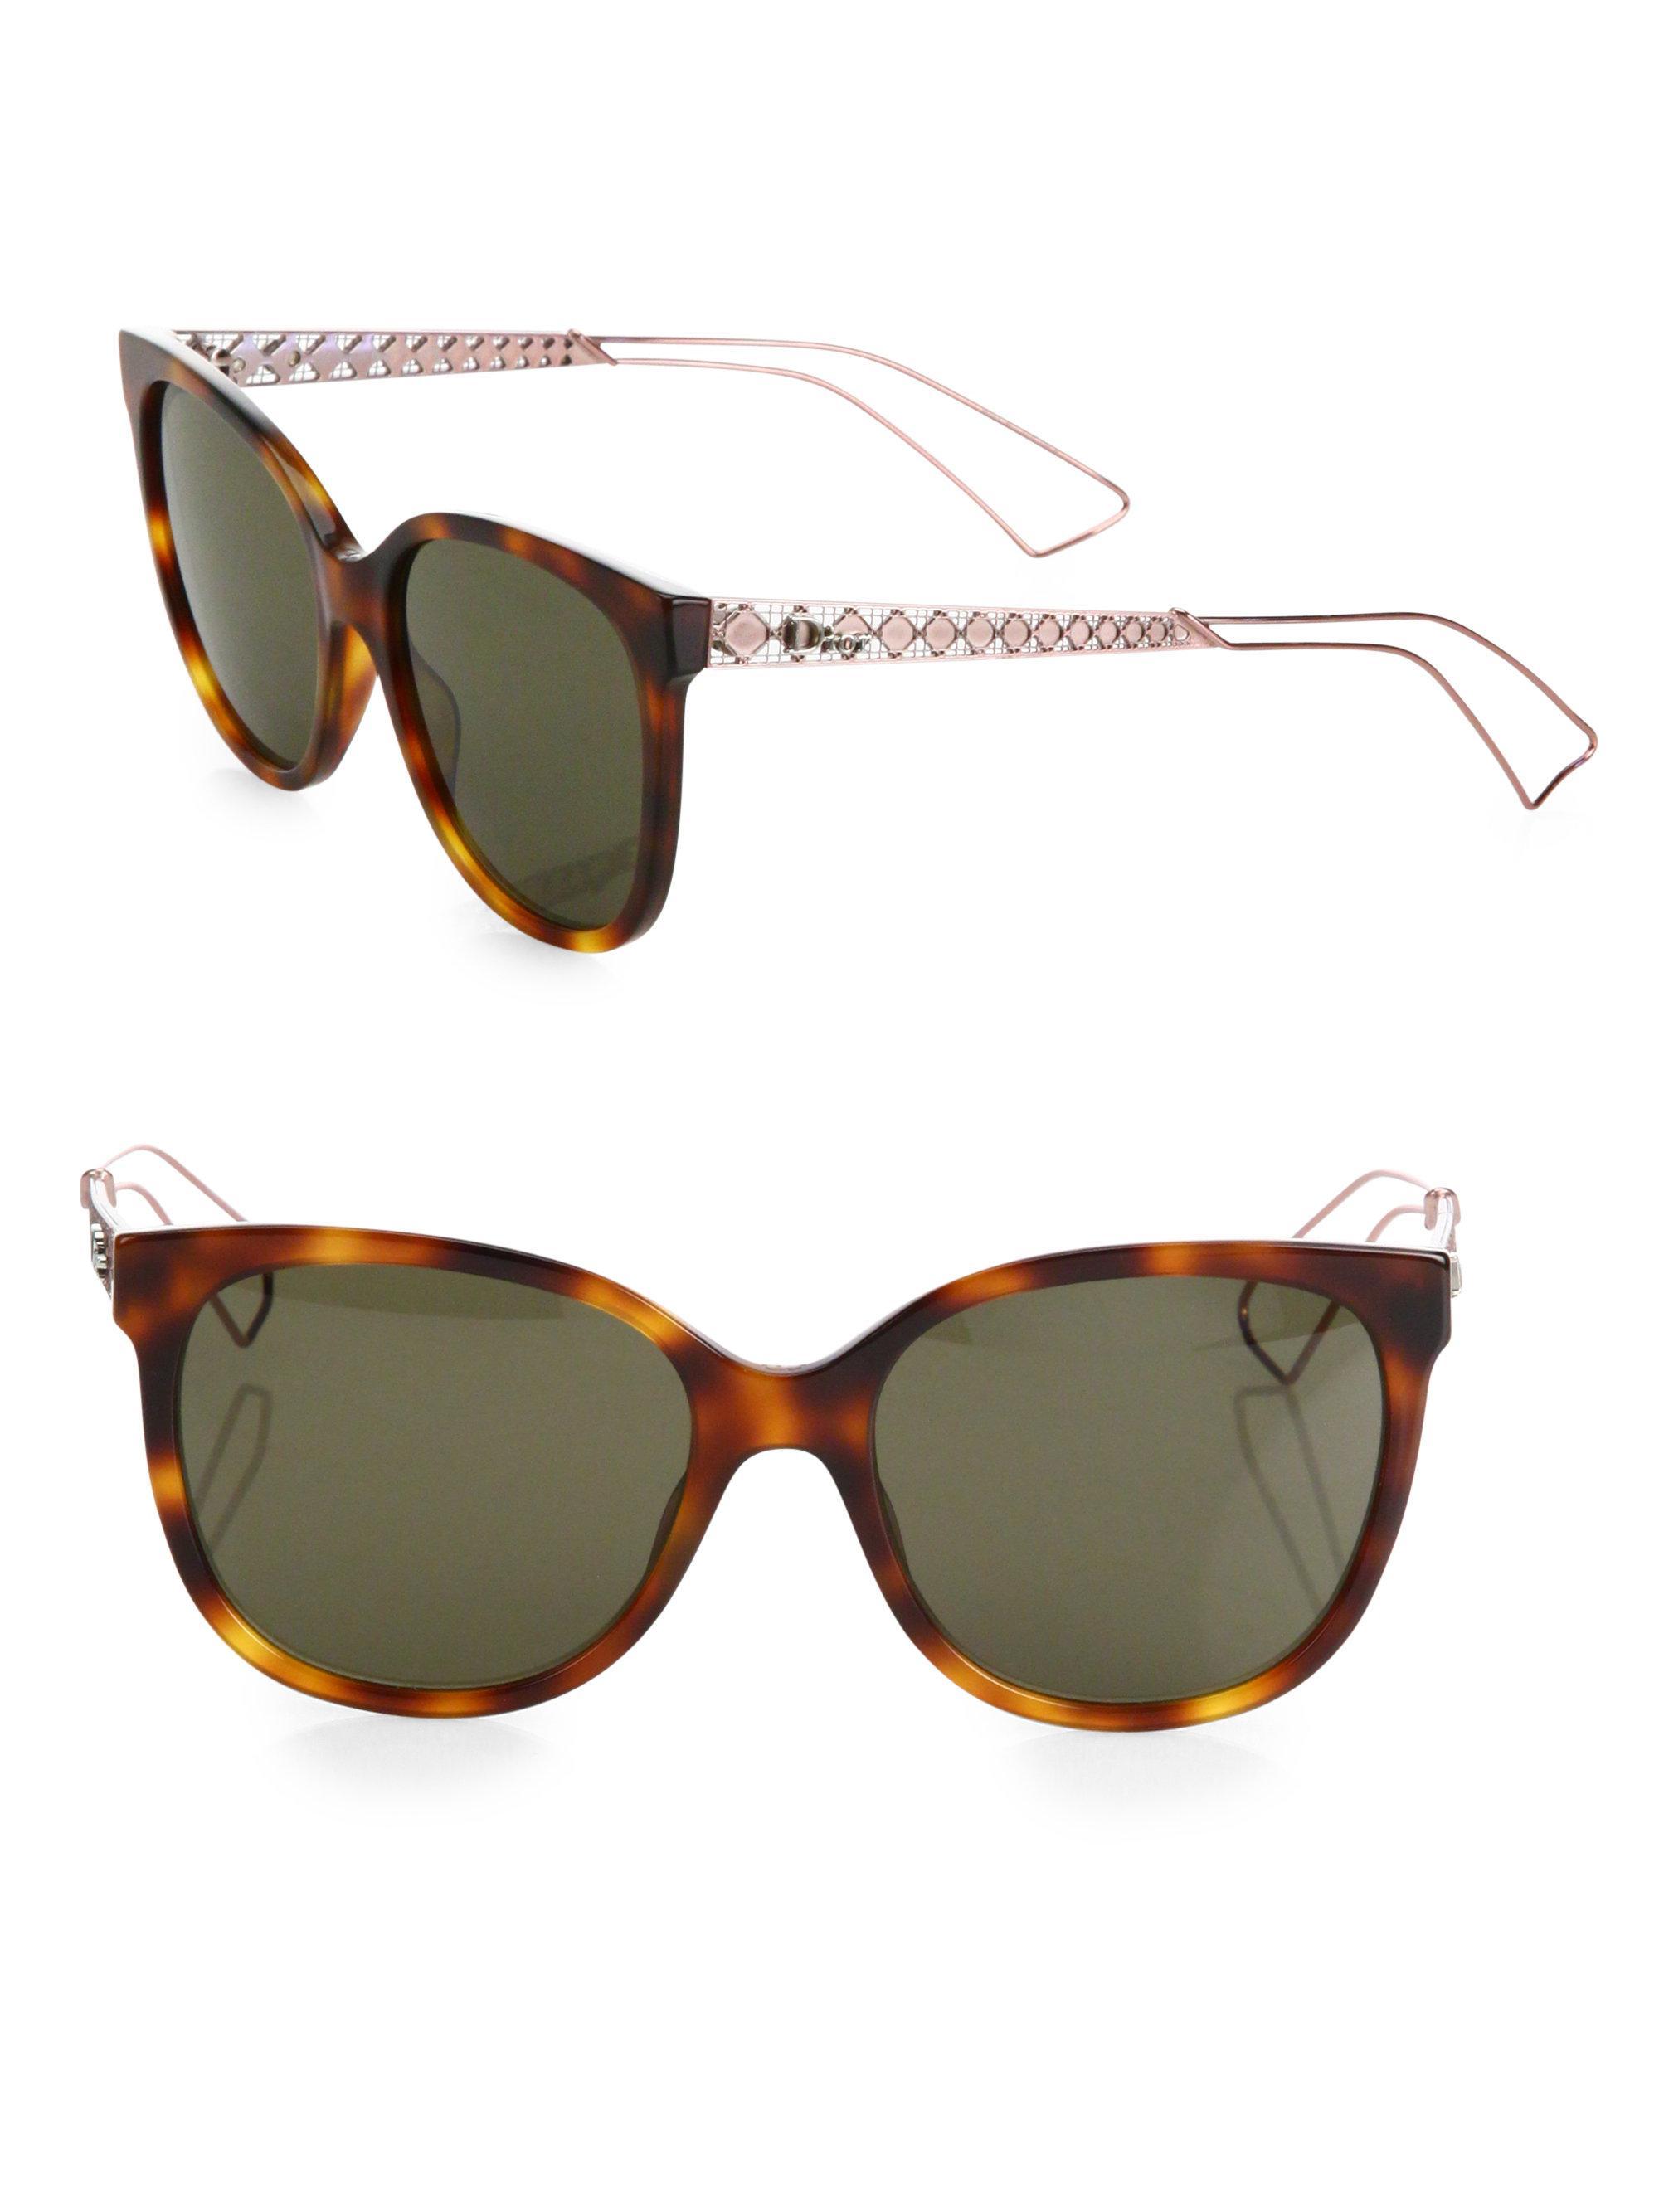 25d31f0a063 Lyst - Dior Ama 3 55mm Square Sunglasses